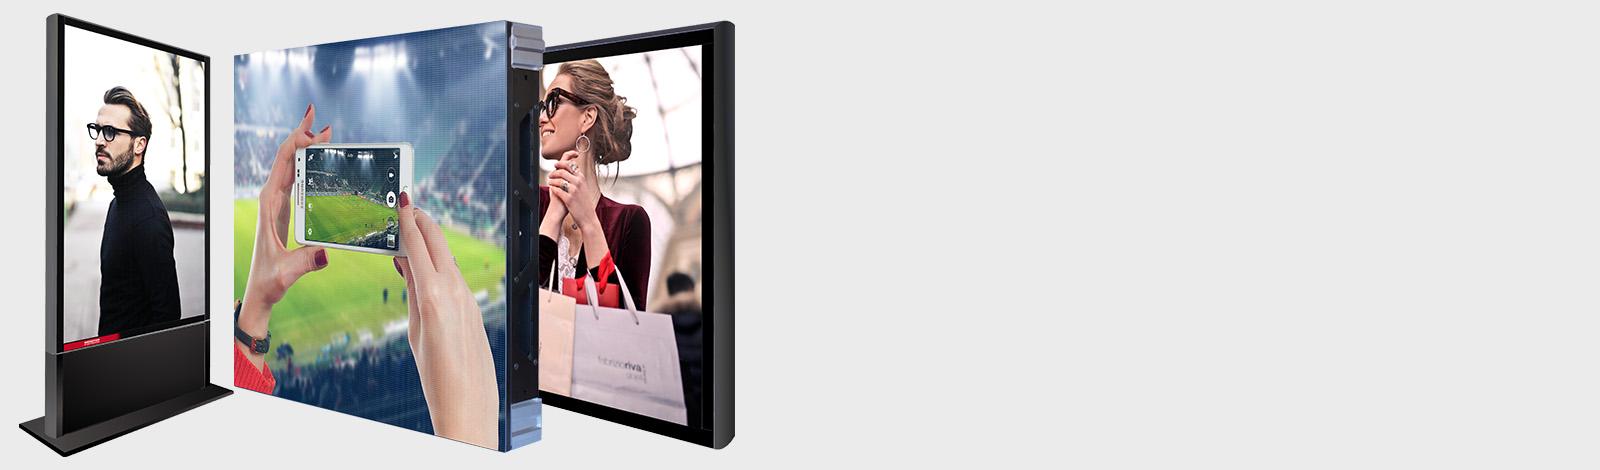 LED Video Walls & Displays